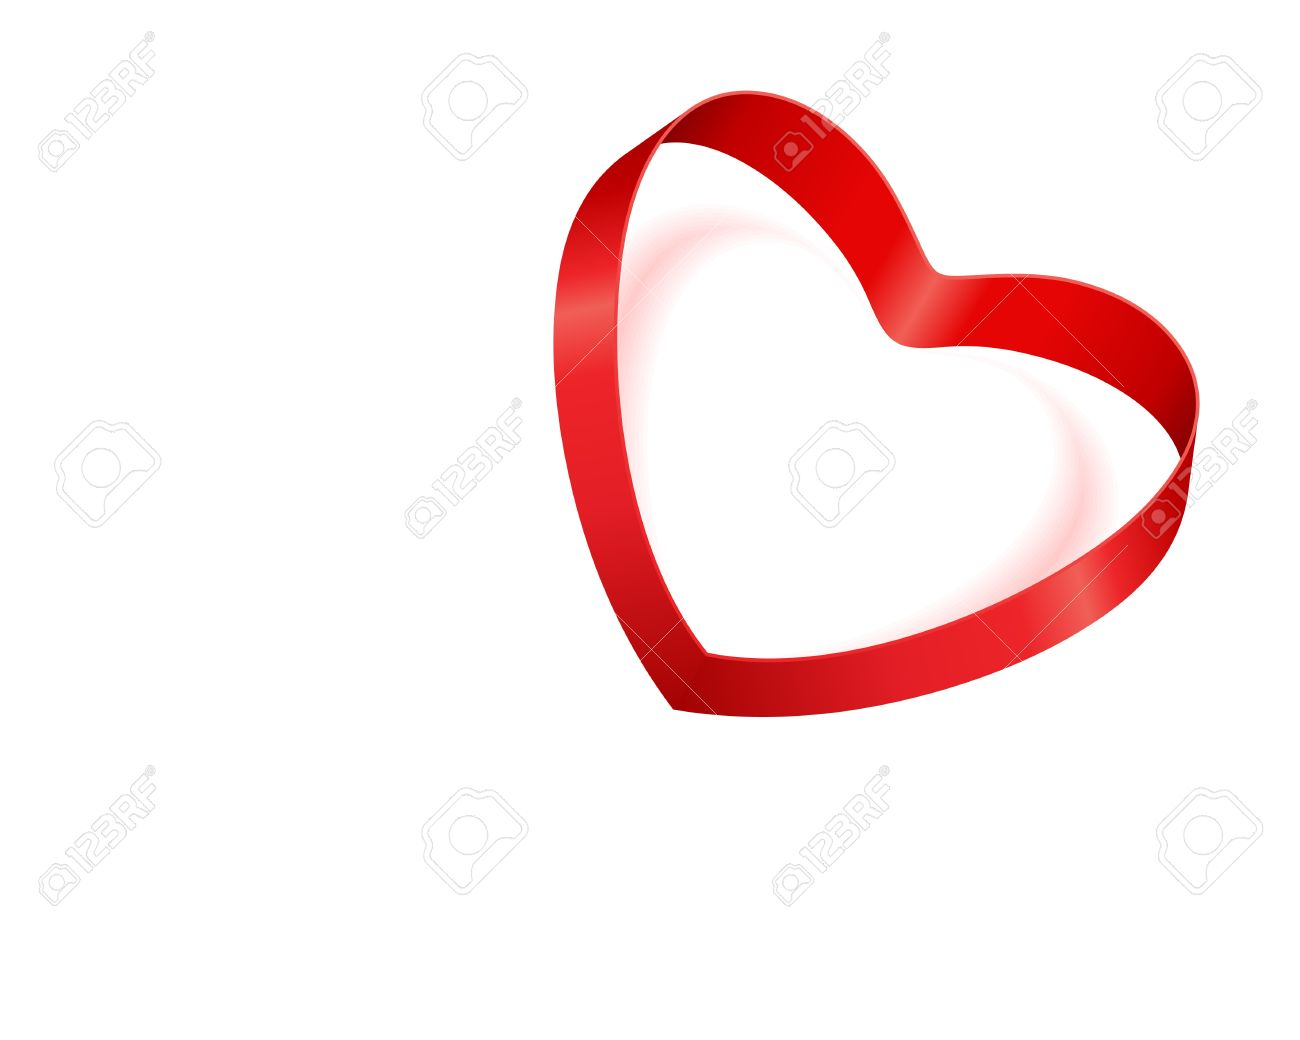 Line Art Love Heart : Wedding hearts images etame mibawa